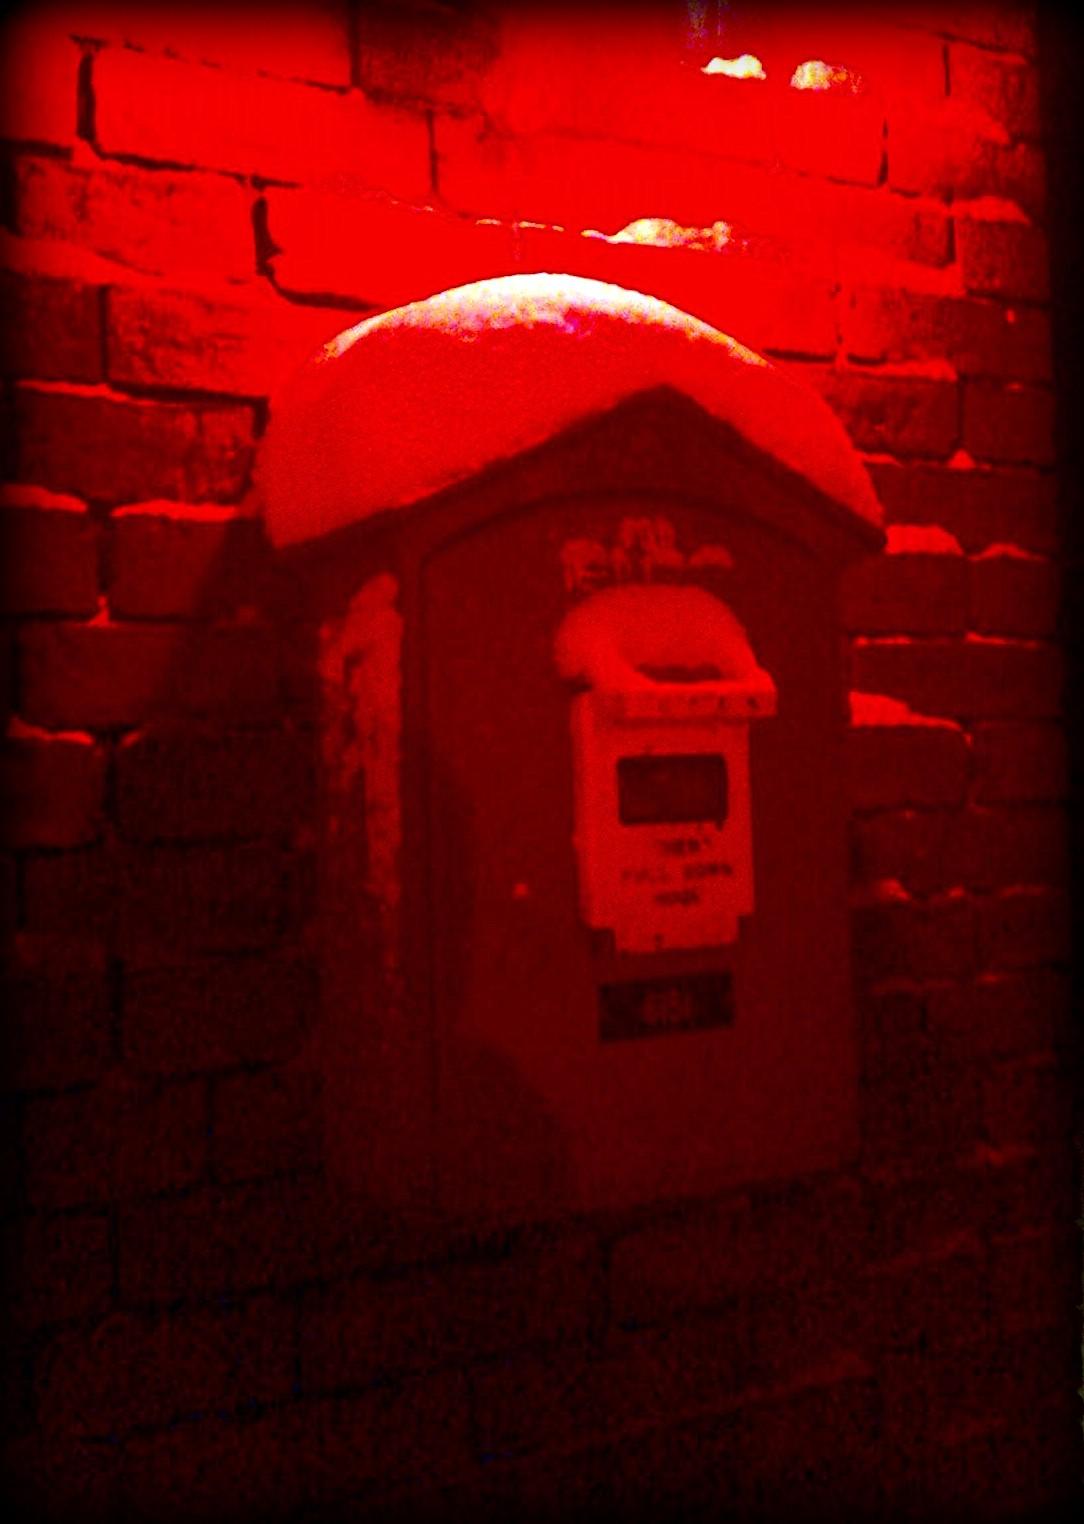 fire call box, fire station, red, salem, snow